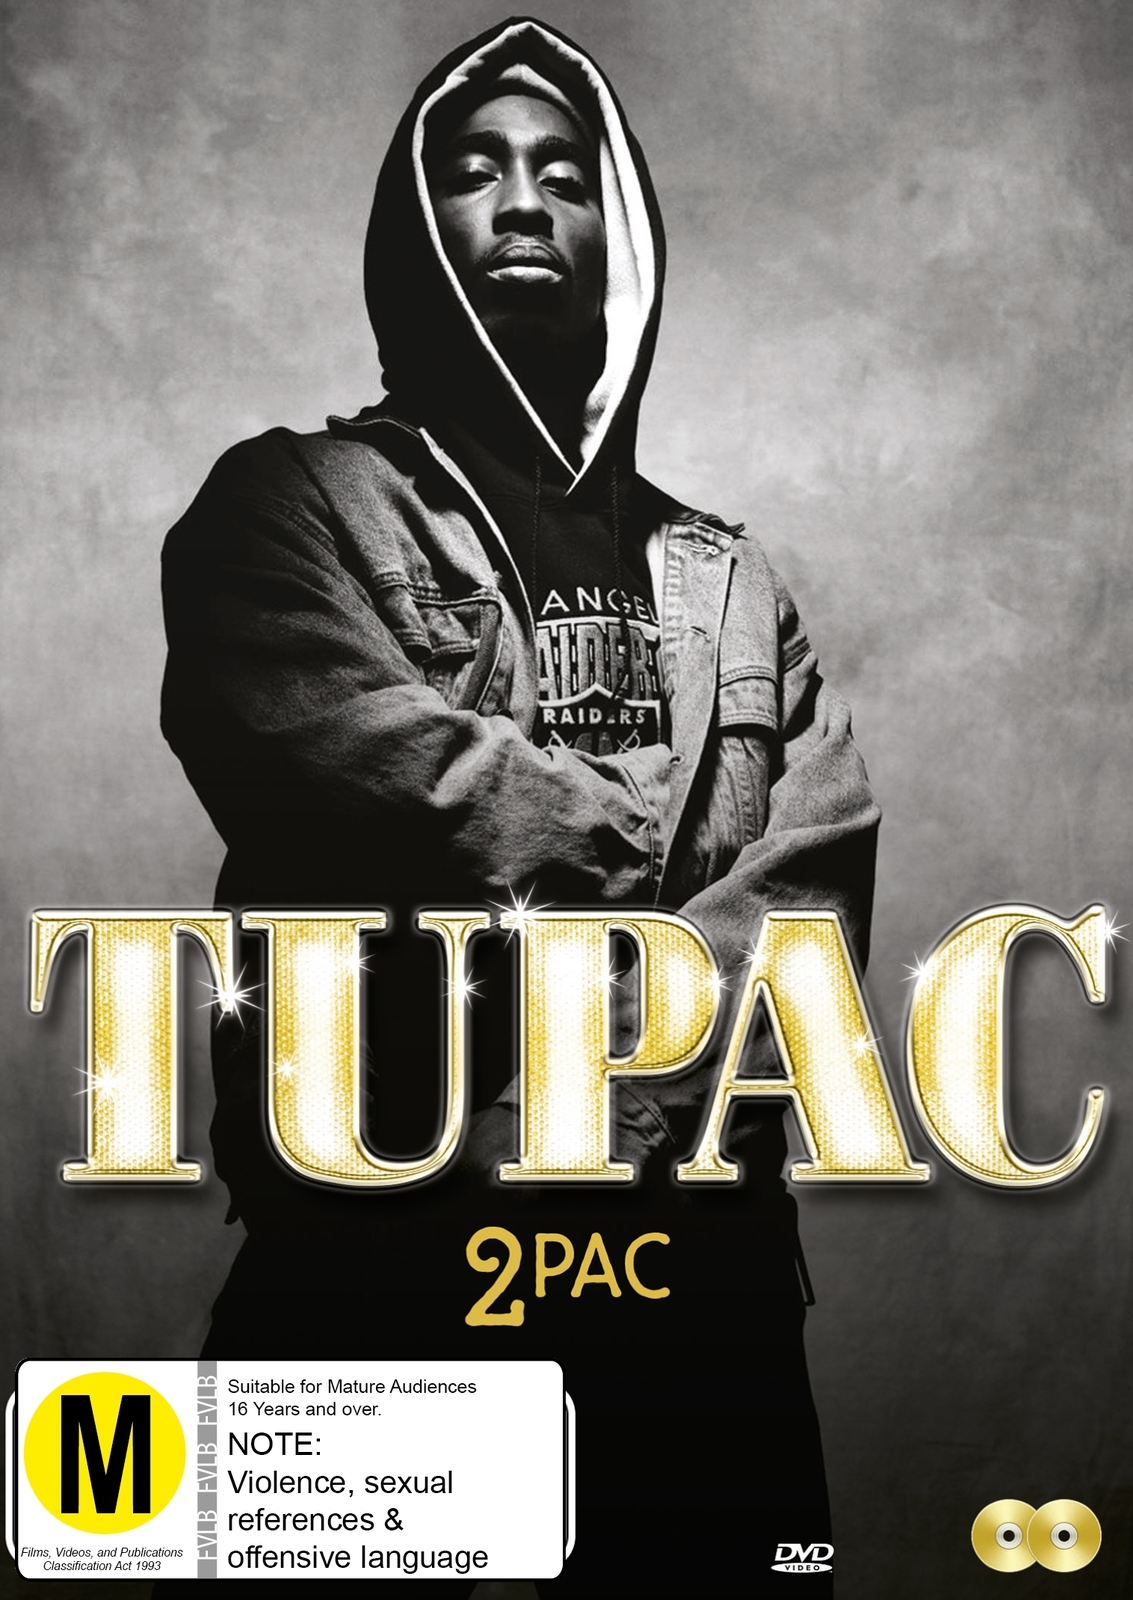 Tupac - 2pac on DVD image